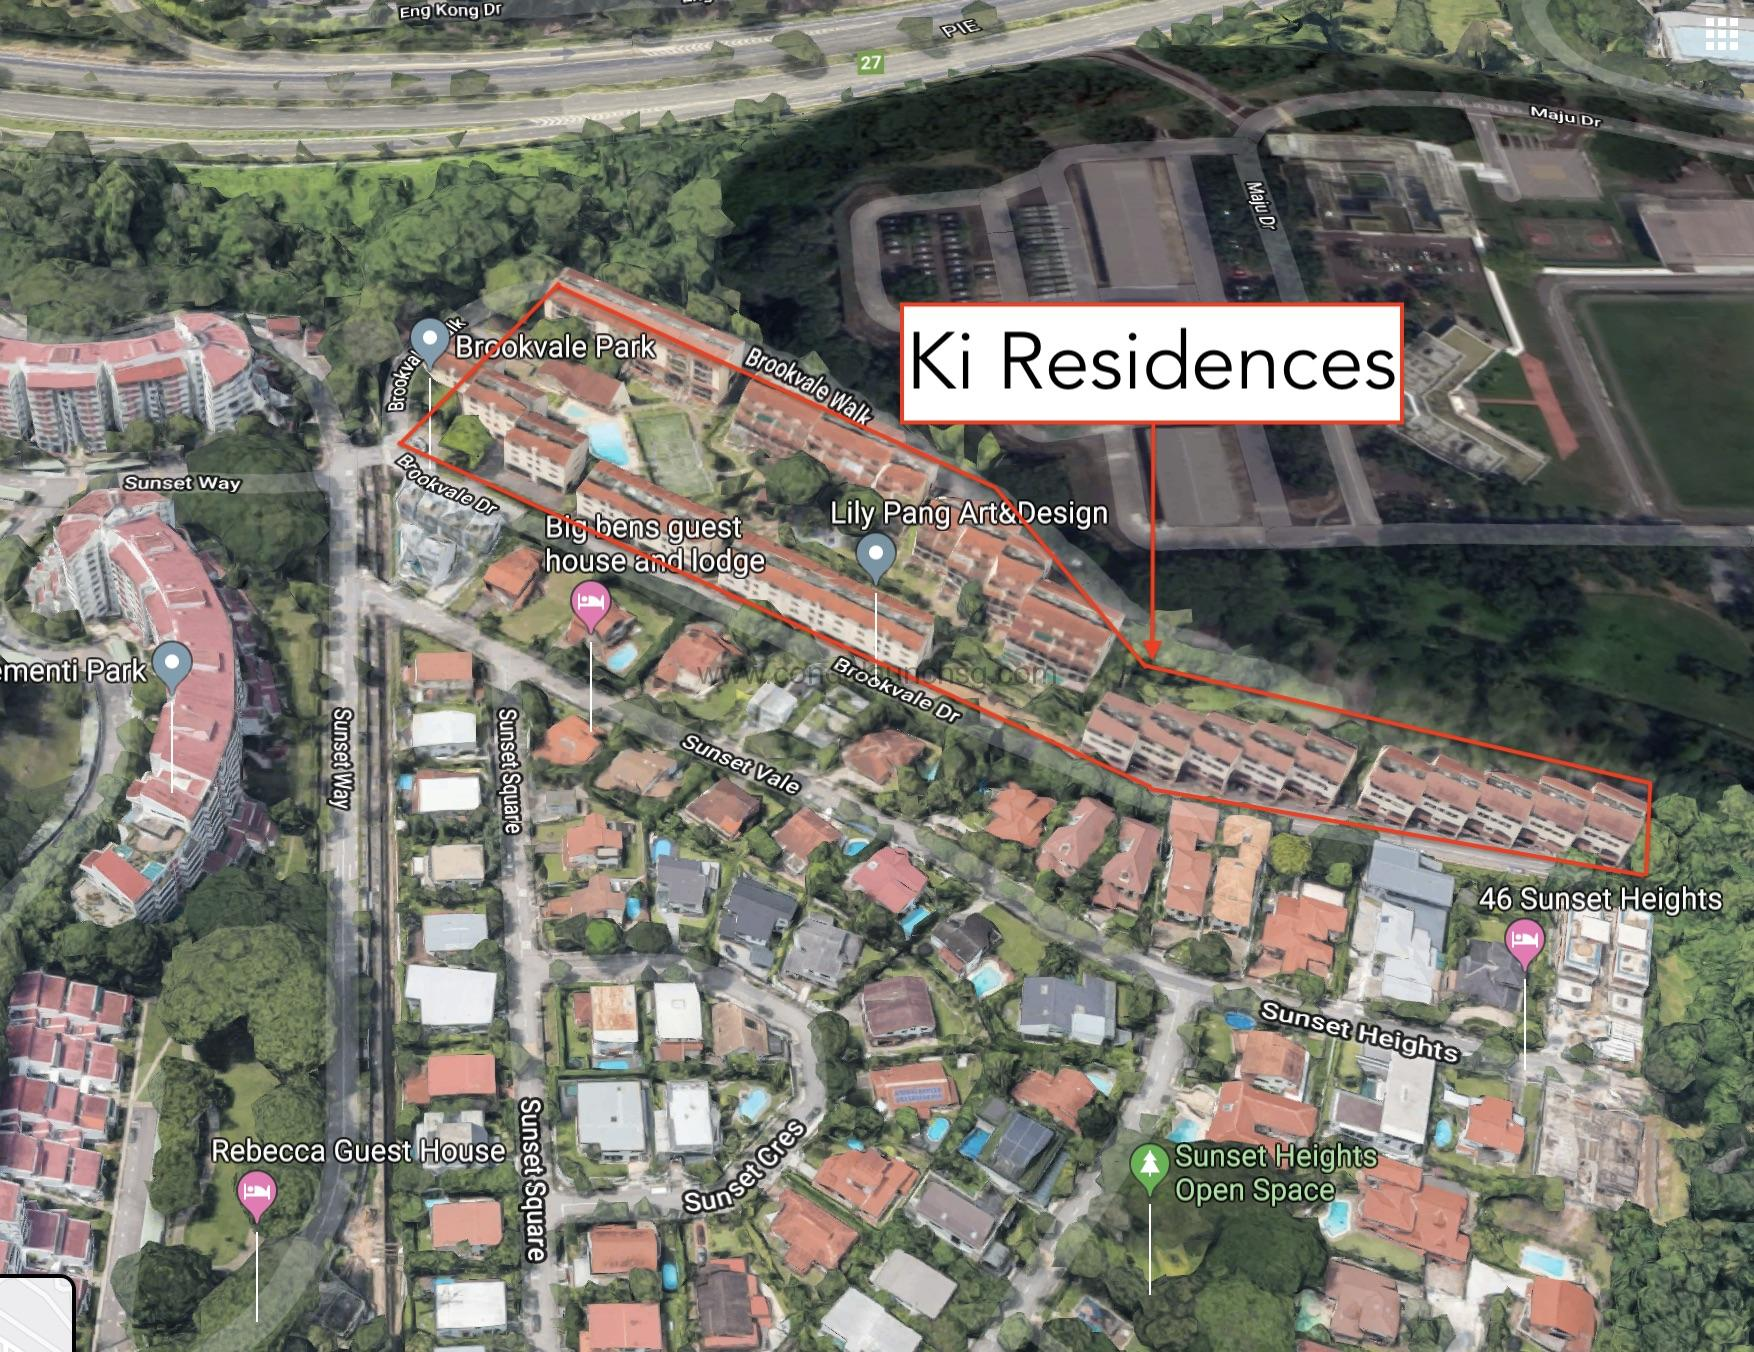 KI Residences at Brookvale Showflat, Floor Plan, Pricing & Review